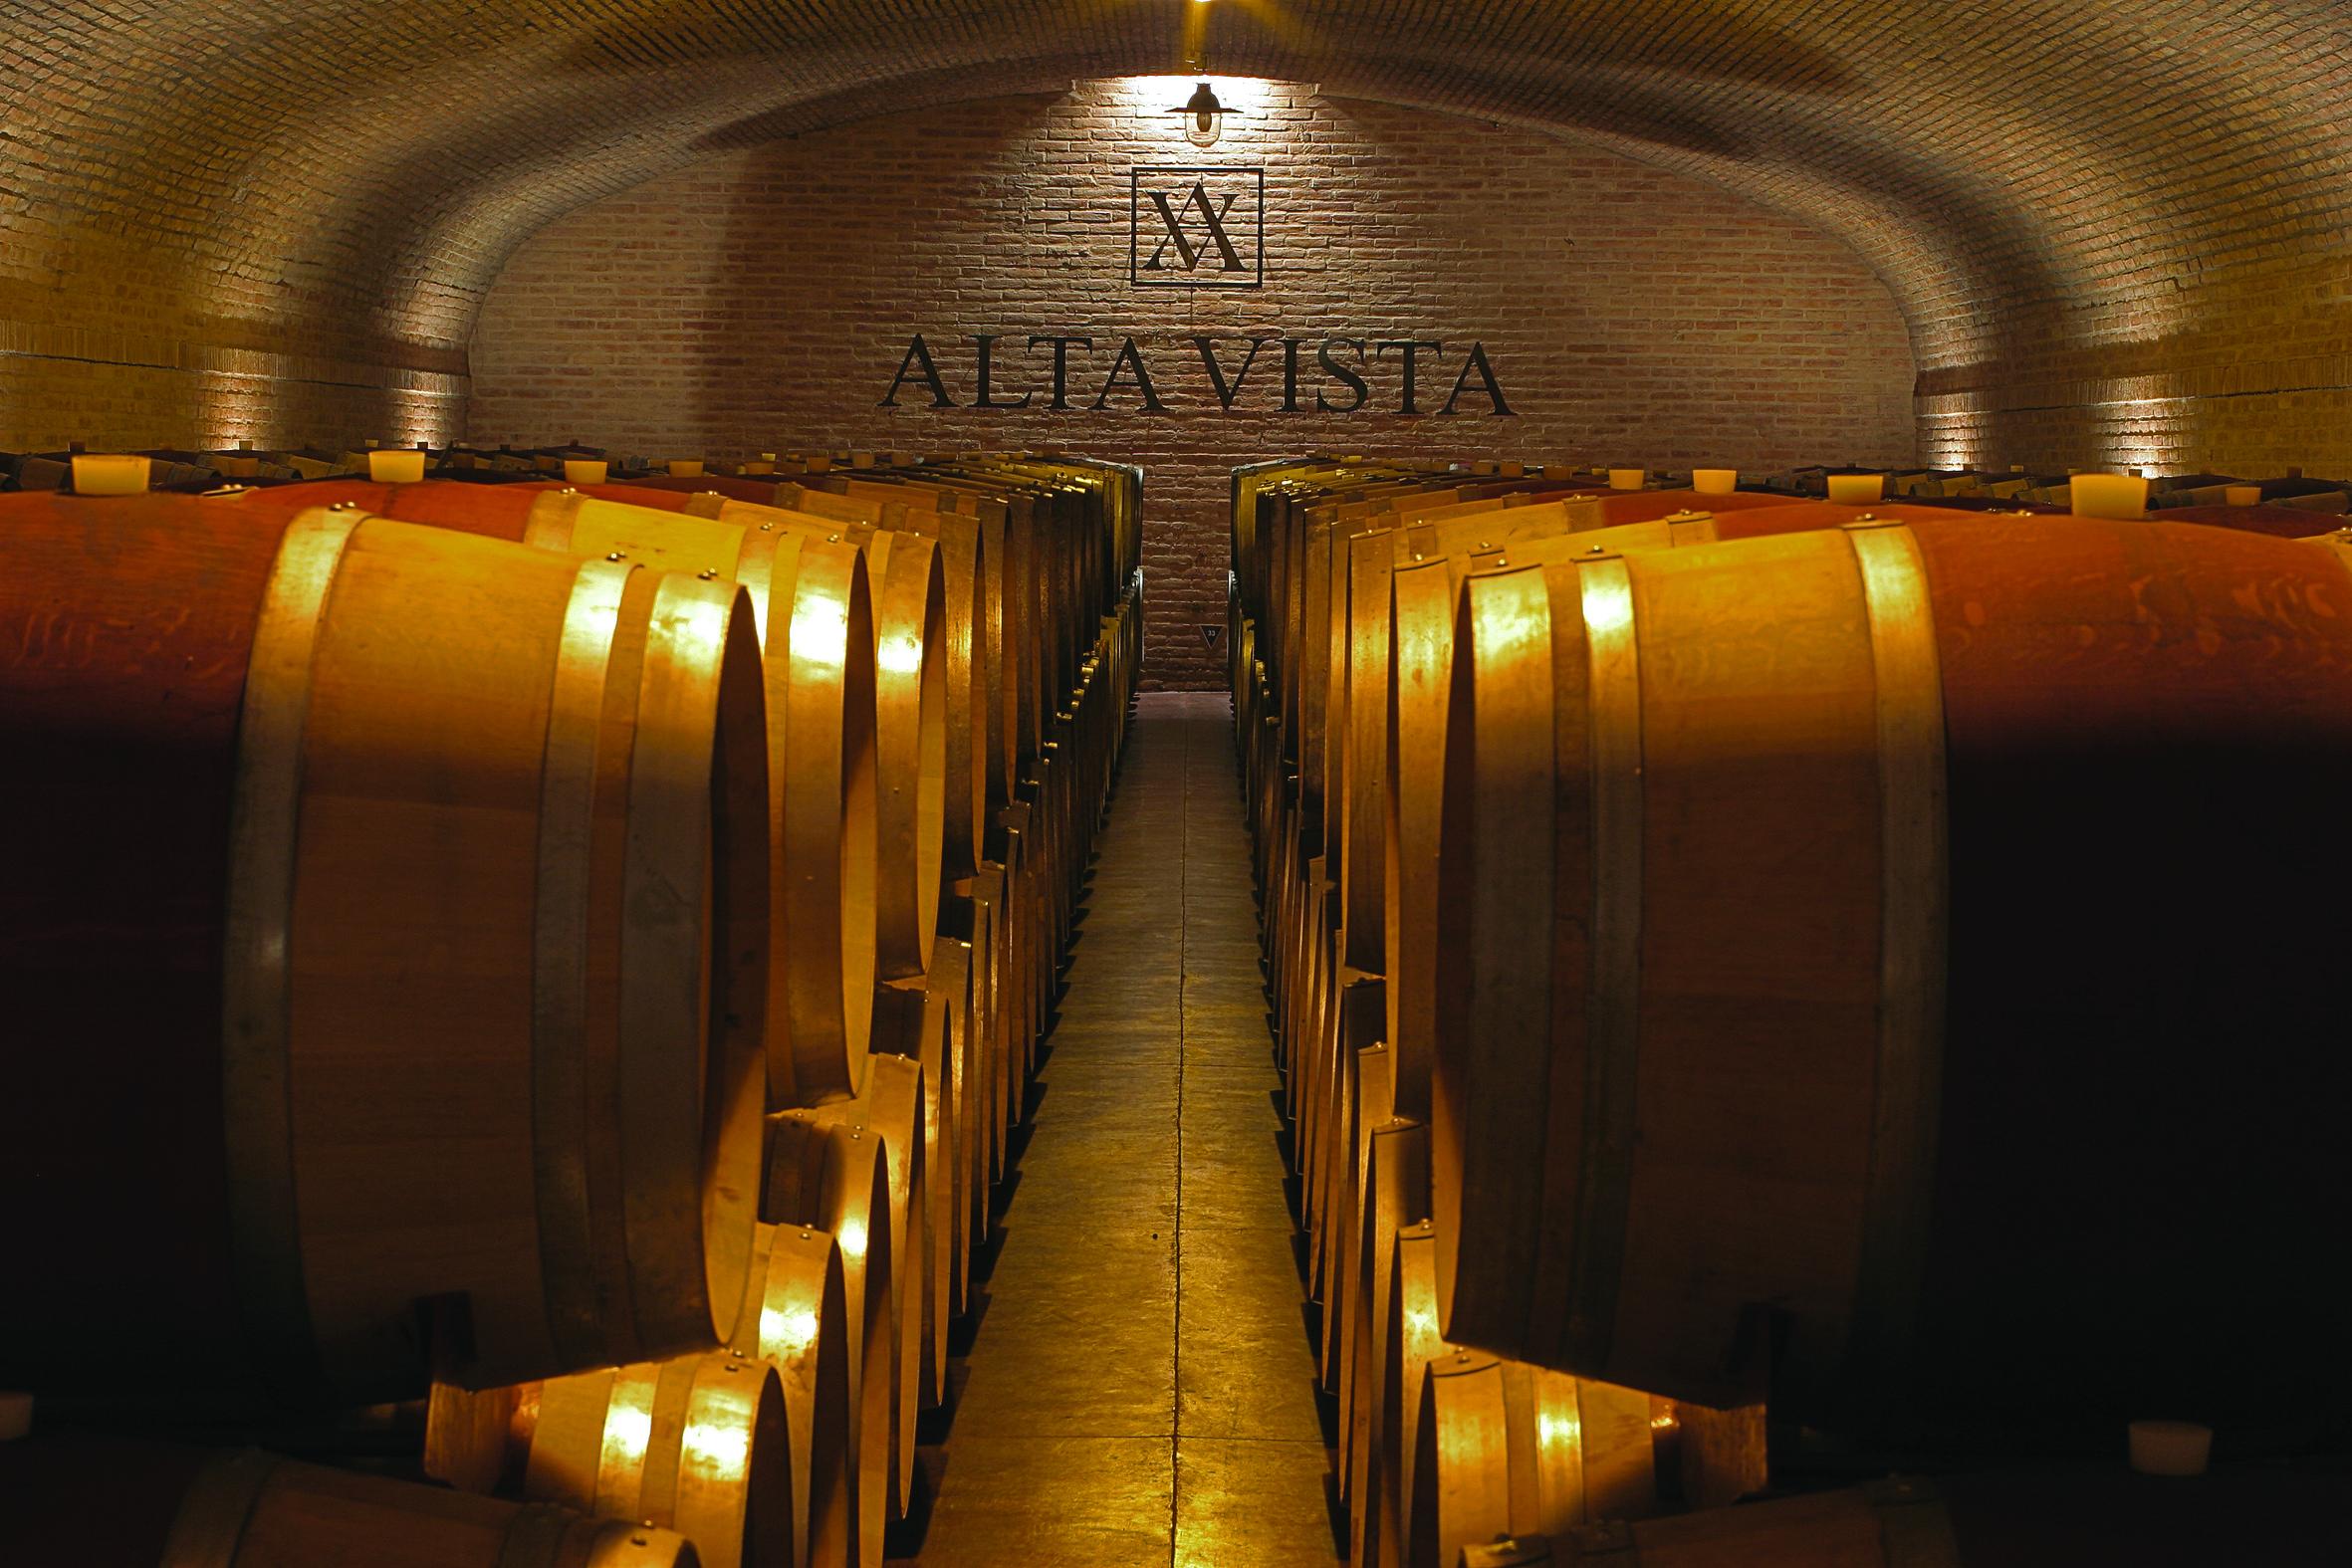 AltaVista_CaveBarricas